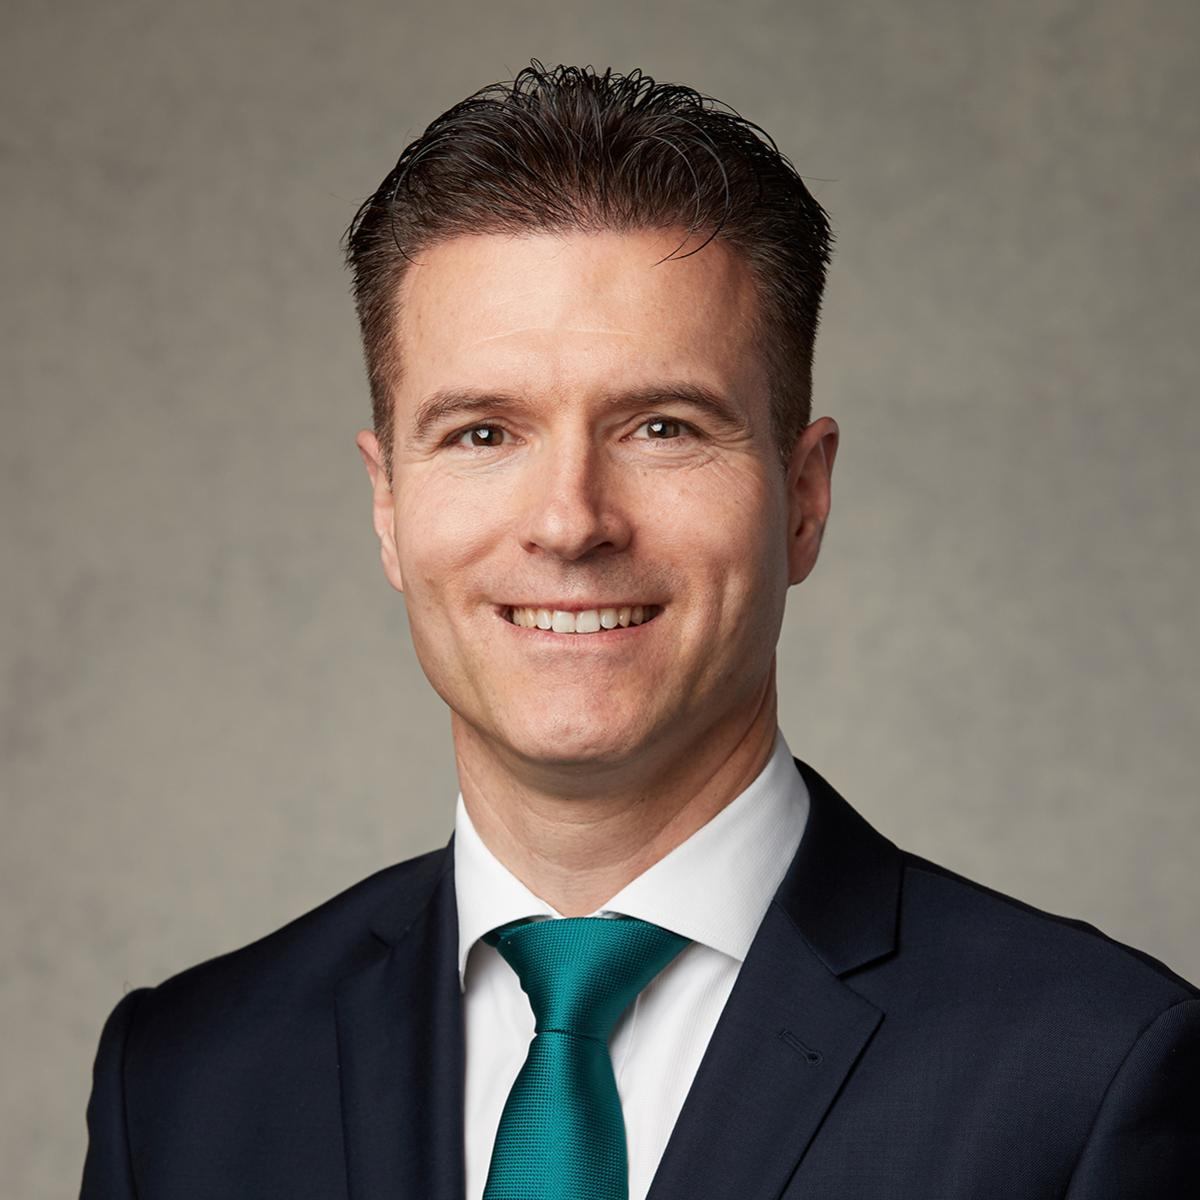 Elder Thomas Hänni, Suisse